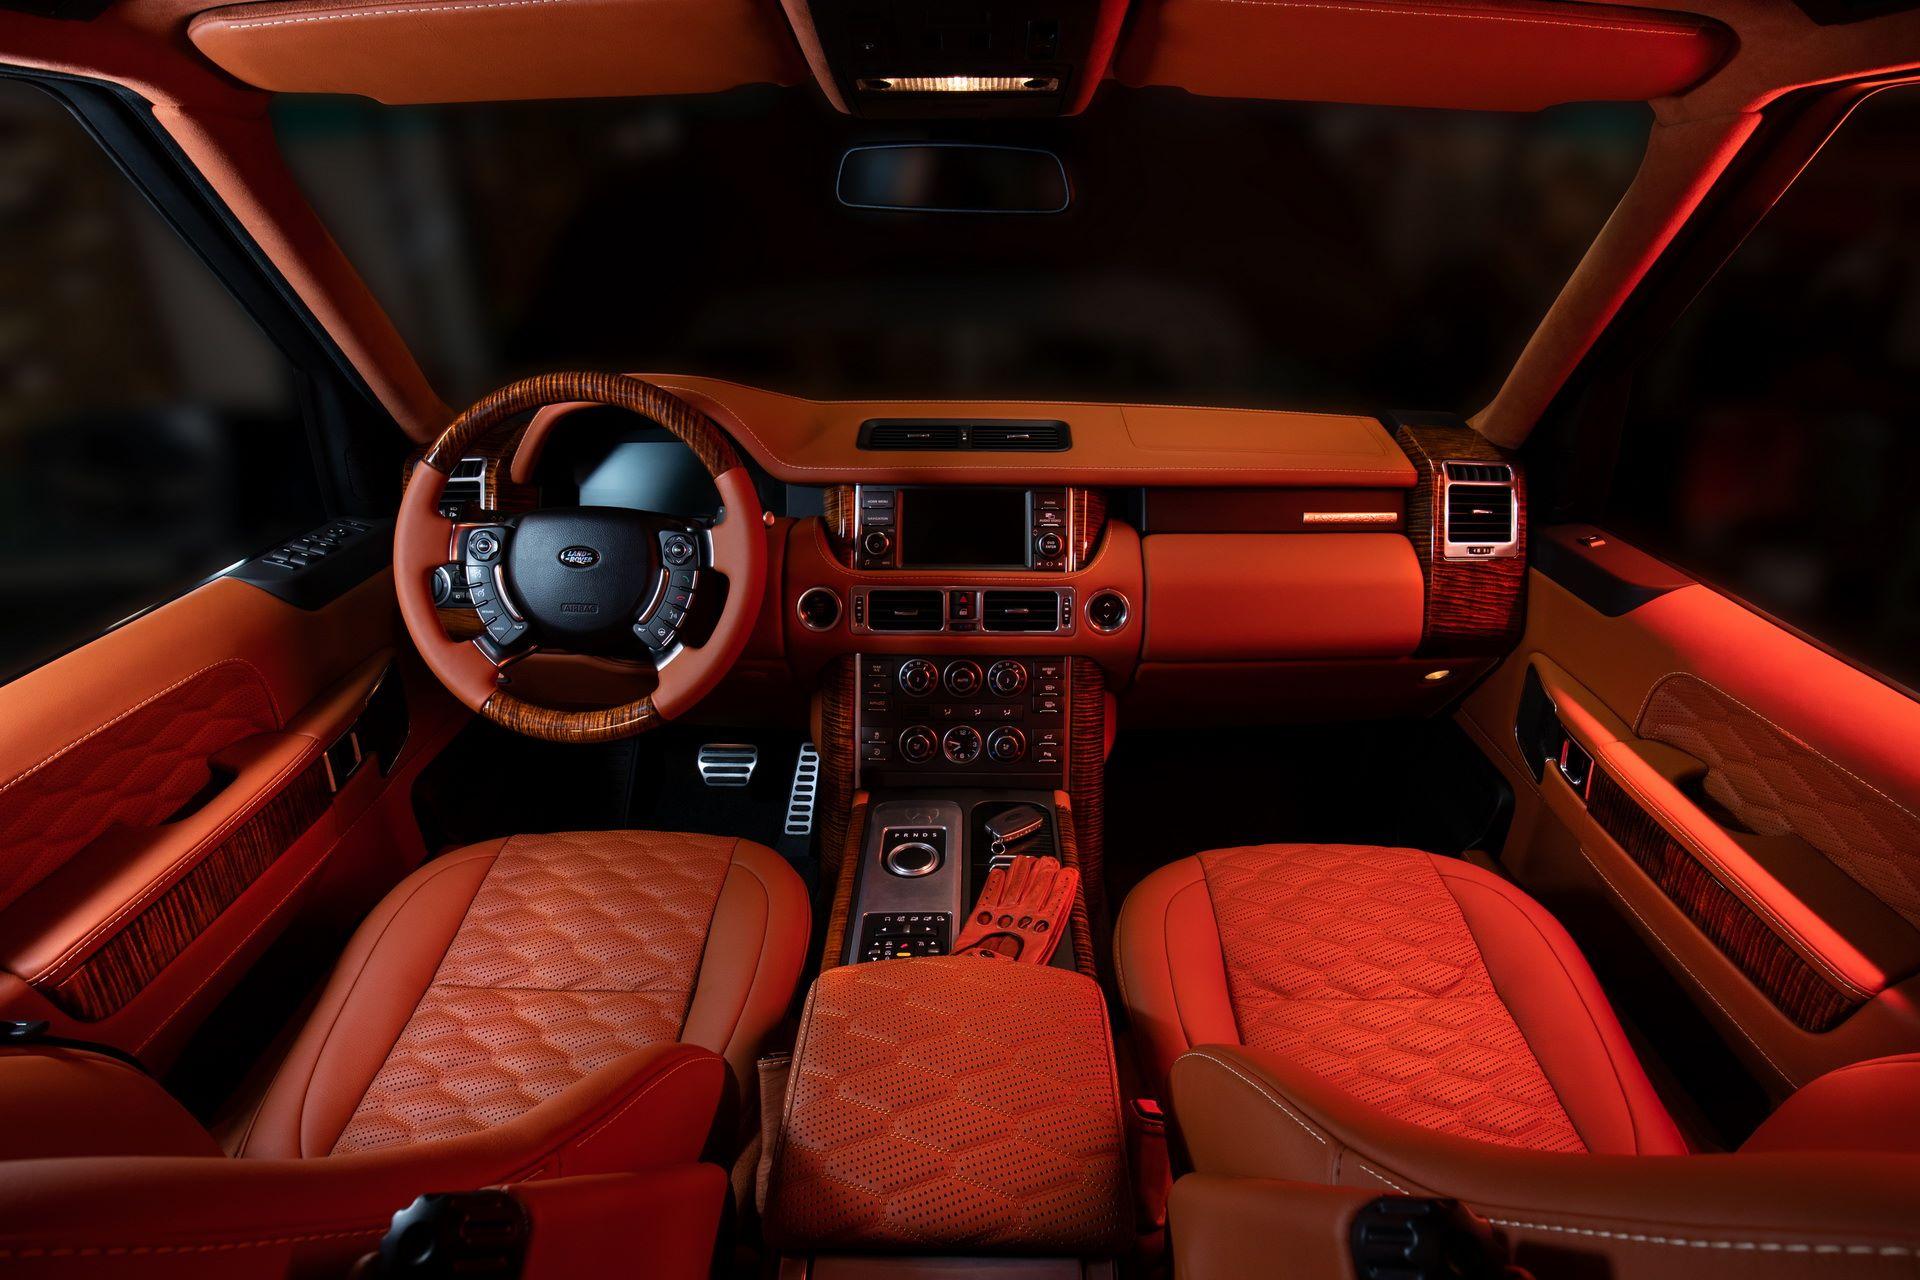 Range-Rover-Autobiography-By-Vilner-6